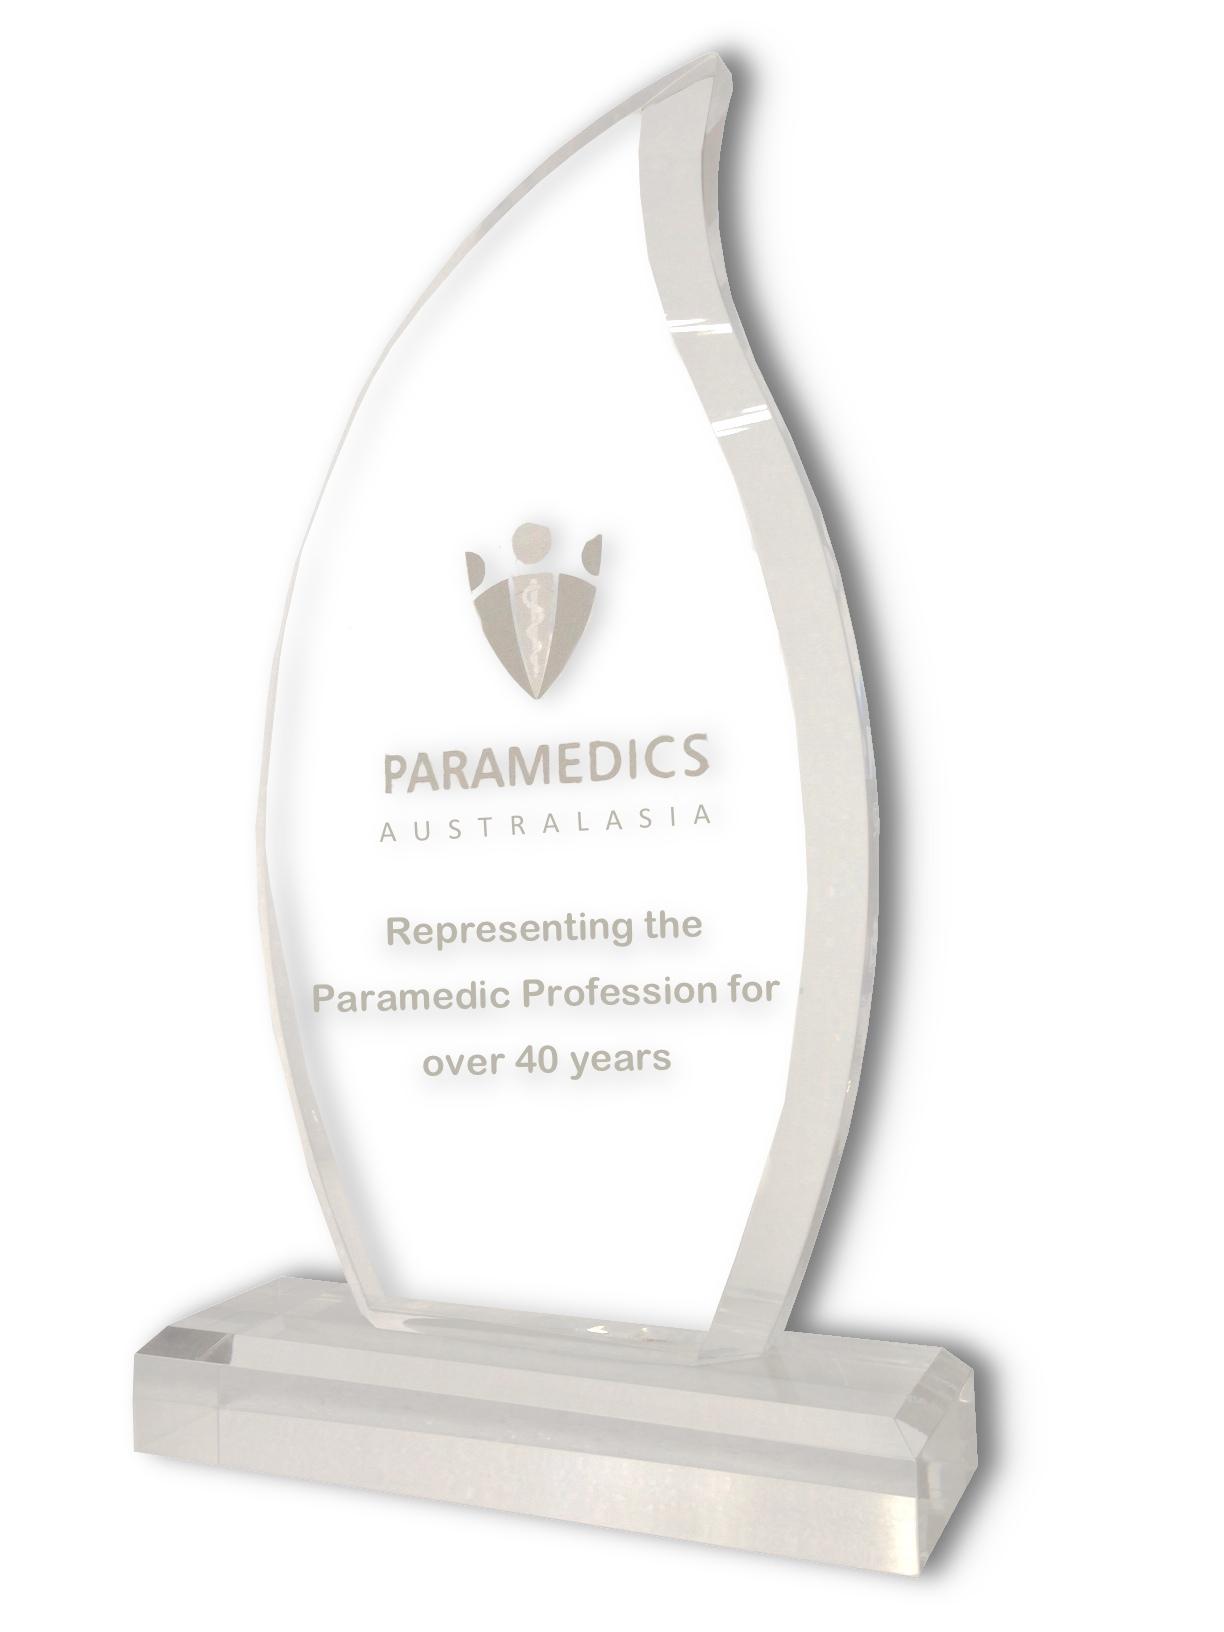 Paramedics Australasia